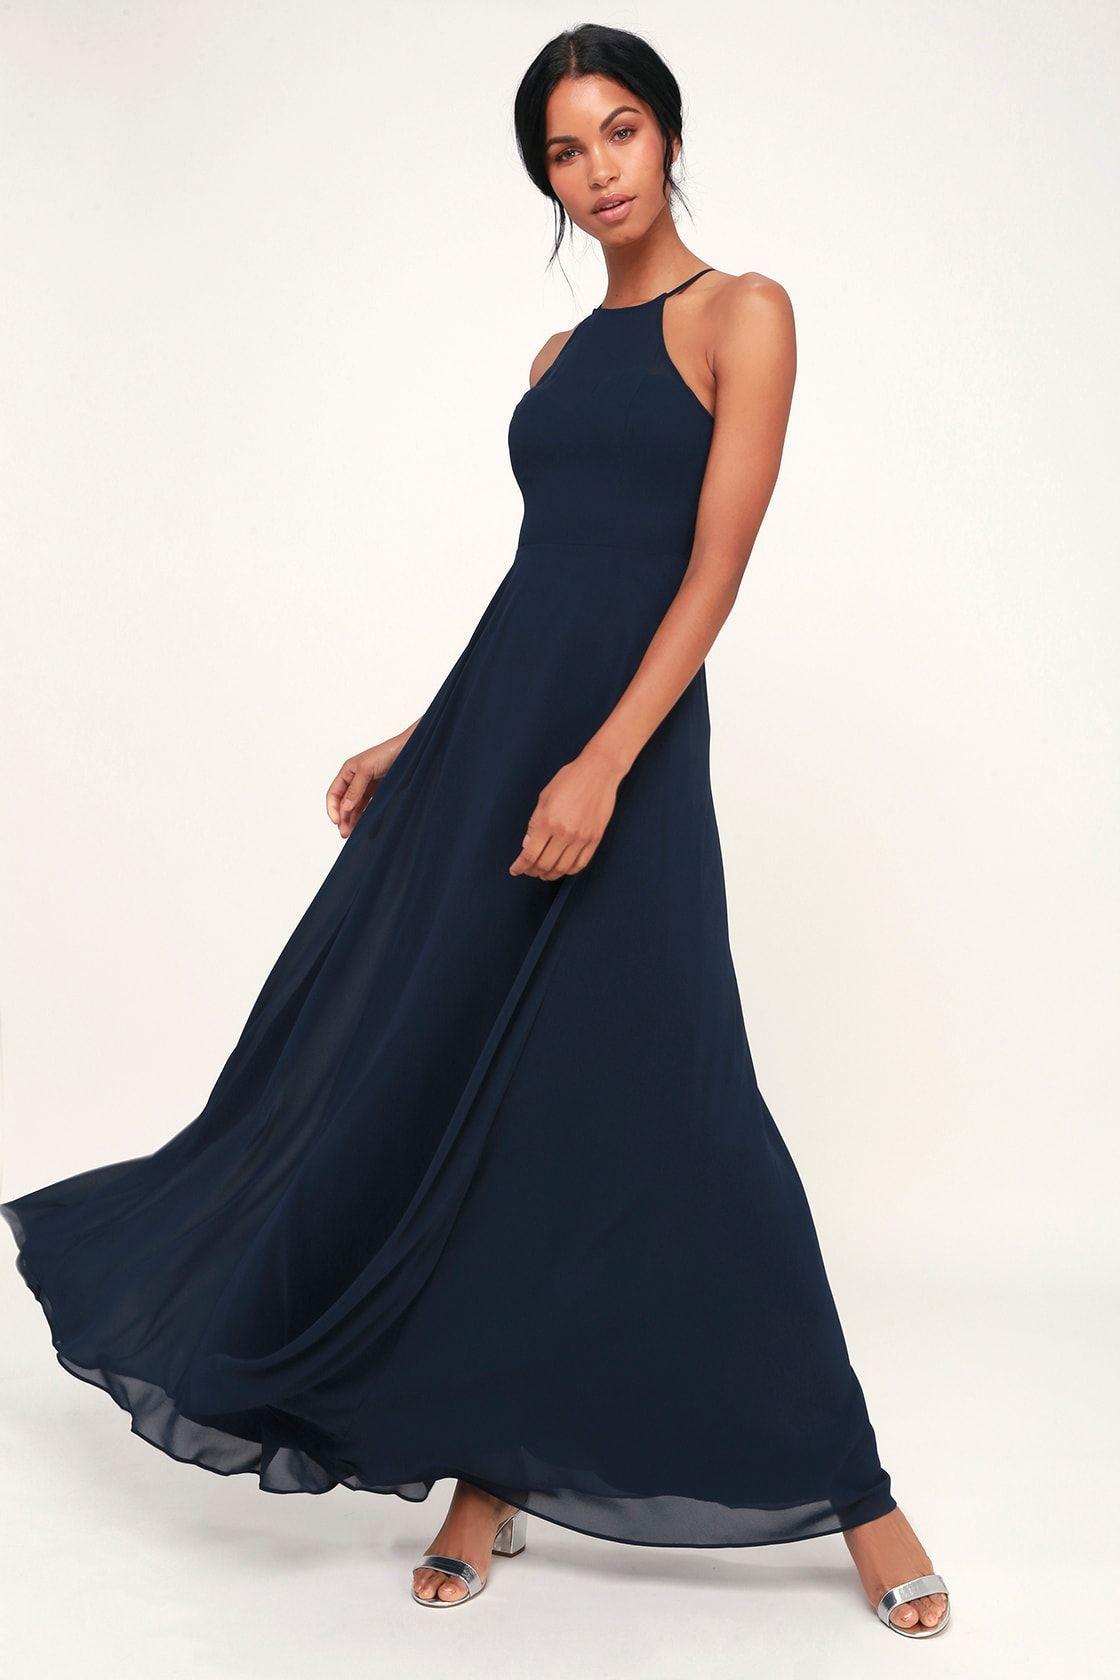 Glam Navy Blue Maxi Dress Sweetheart Maxi Dress Blue Gown Navy Blue Maxi Dress Maxi Dress Blue Maxi Dress [ 1680 x 1120 Pixel ]